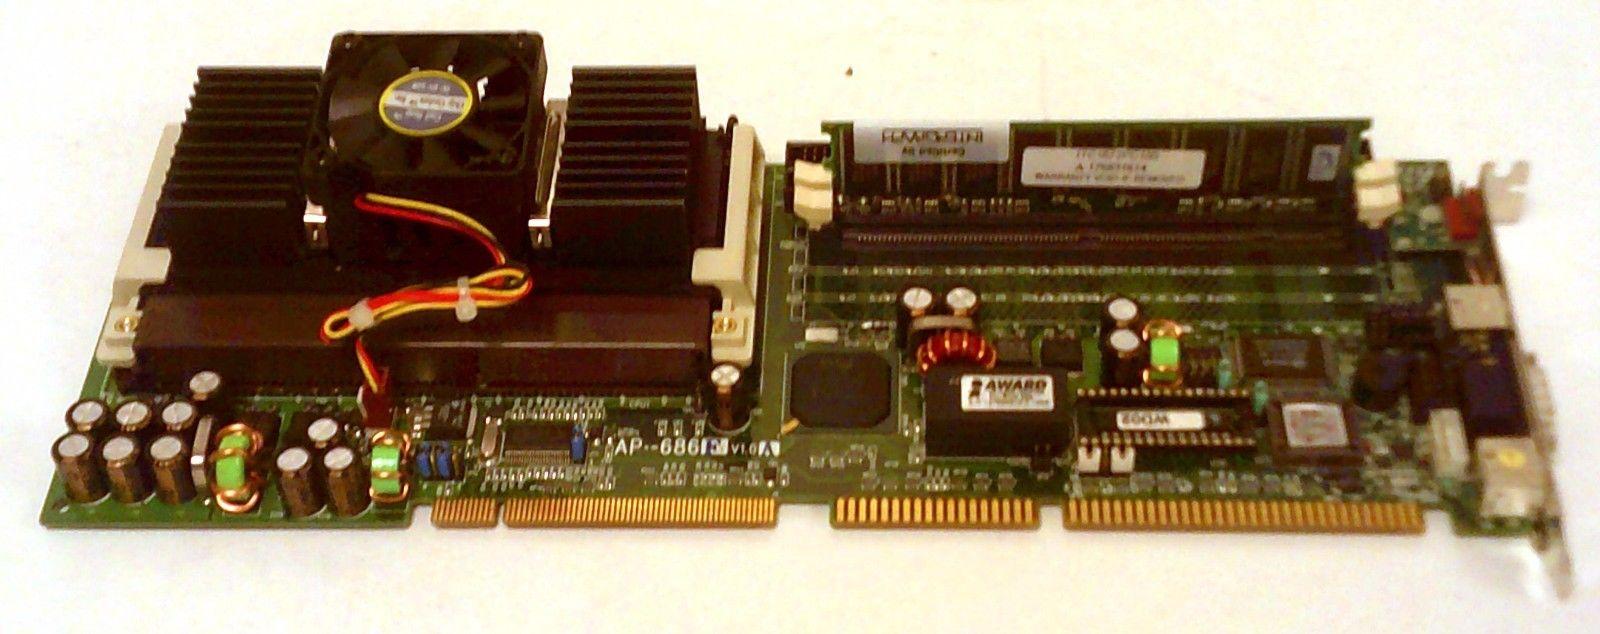 Vintage Intel Pentium II 350Mhz Processor SL2U3 Single Board CPU PC RAM AP-686F